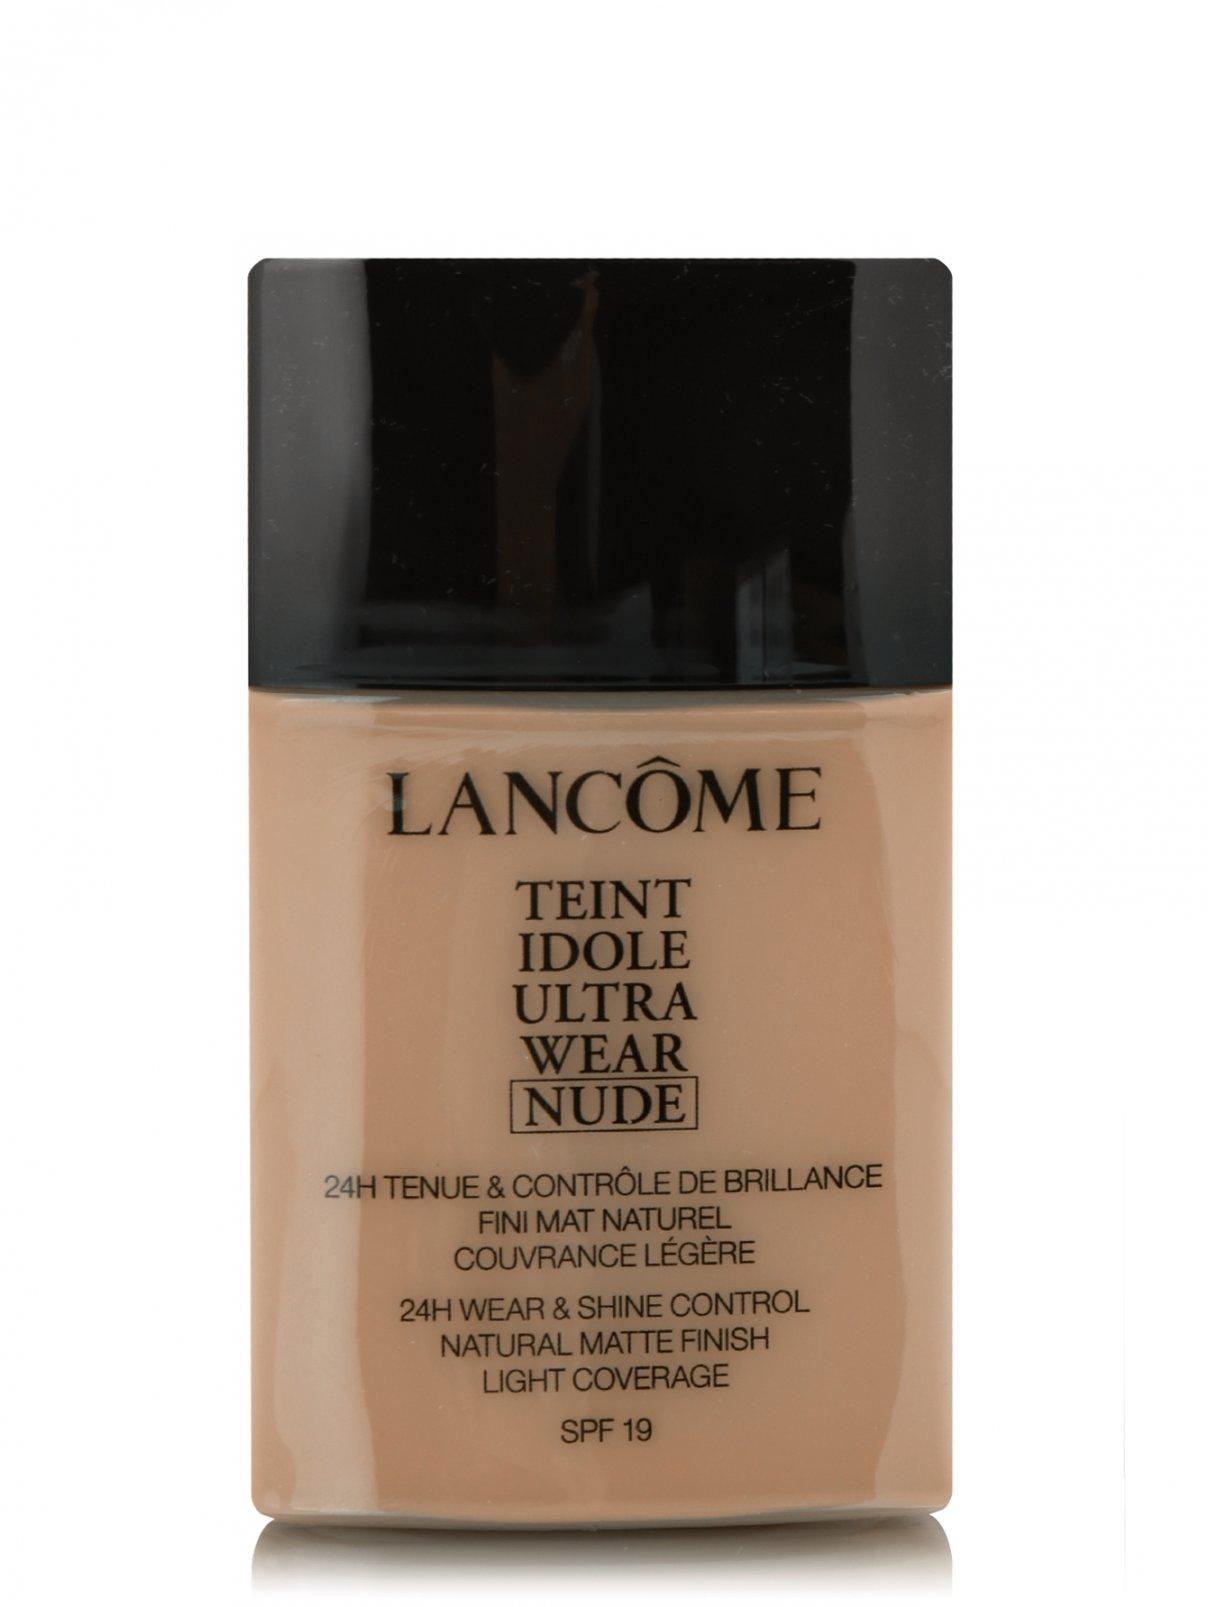 Тональный флюид 06 Teint Idole Ultra Wear Nude Lancome  –  Общий вид